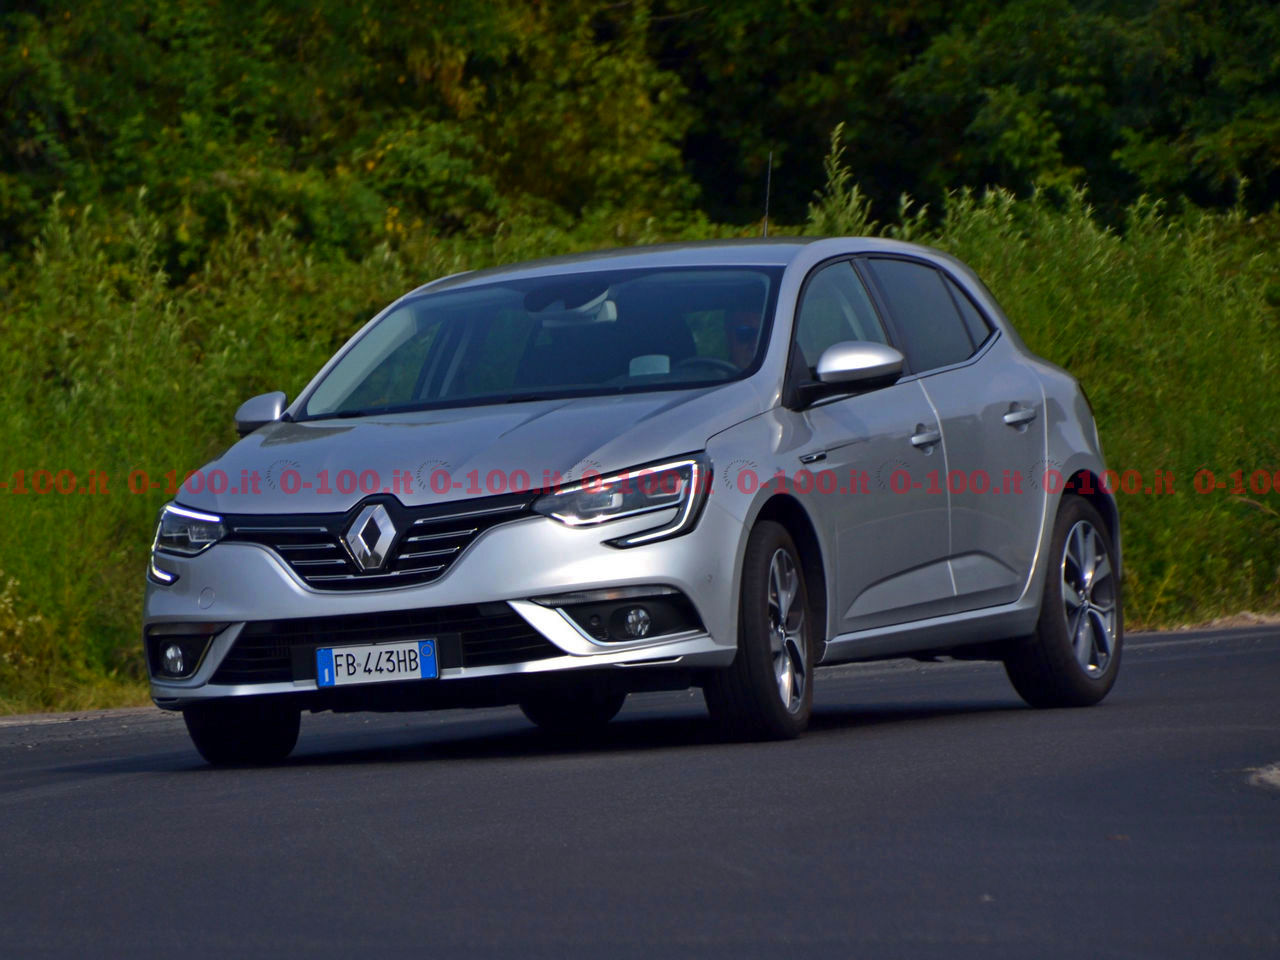 Renault-Megane-GT-Bose-dCi-130-test-prova-opinioni_0-100_13